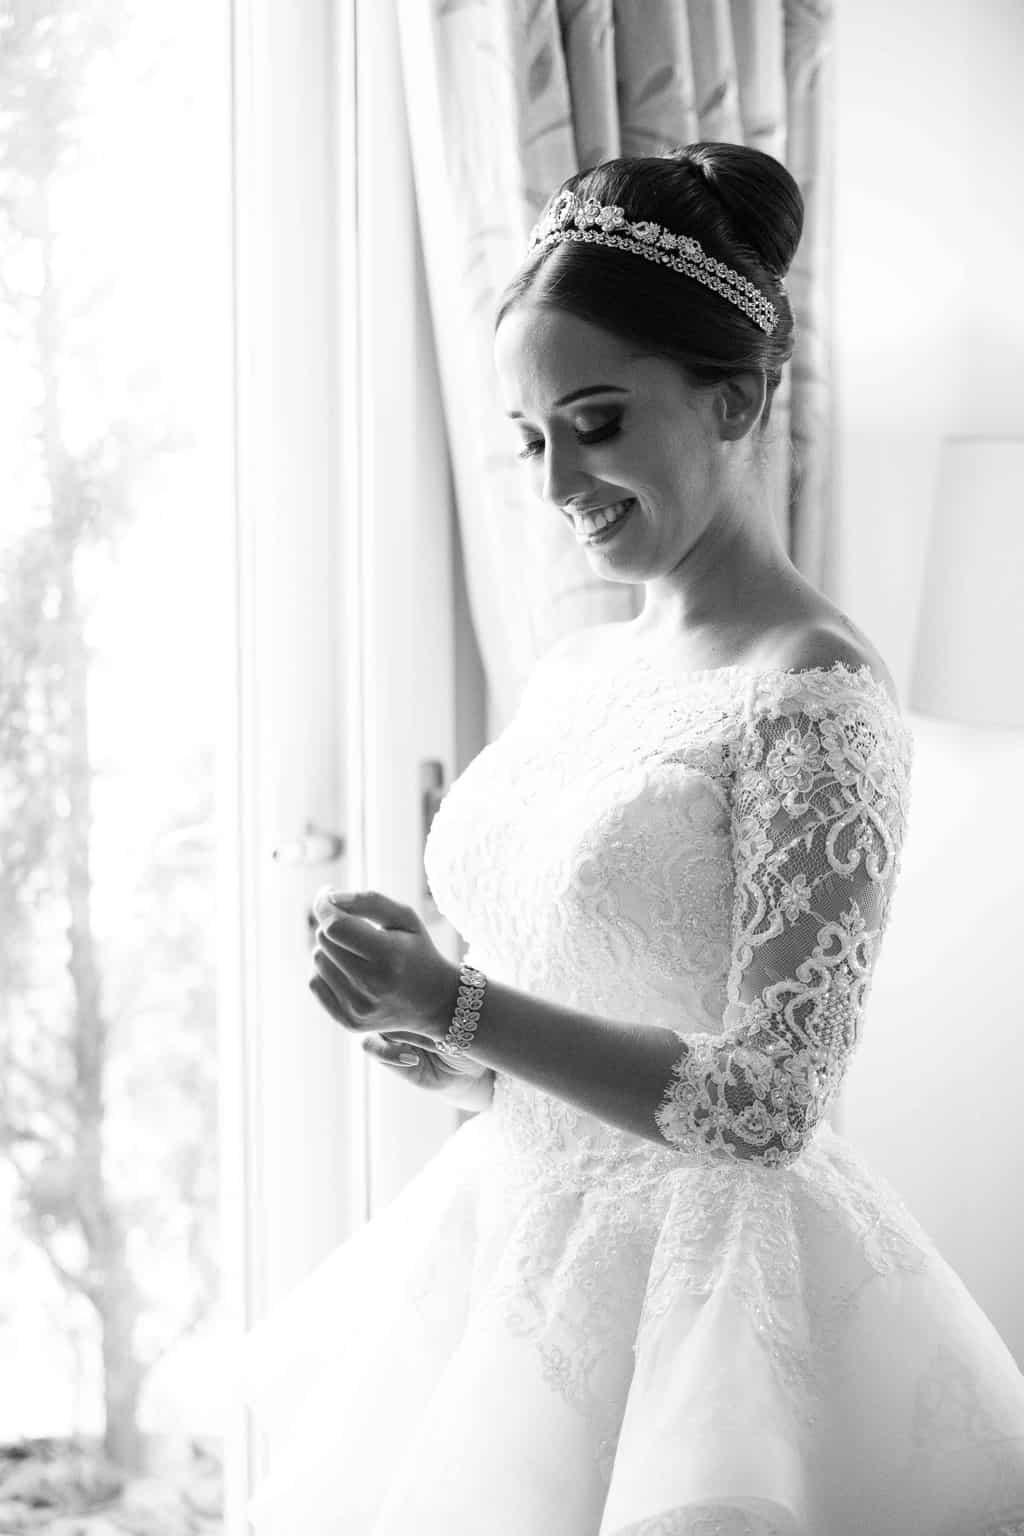 Casamento-Clássico-Casamento-tradicional-Copacabana-Palace-Monica-Roias-Ribas-Foto-e-Vídeo-Tuanny-e-Bernardo-CaseMe